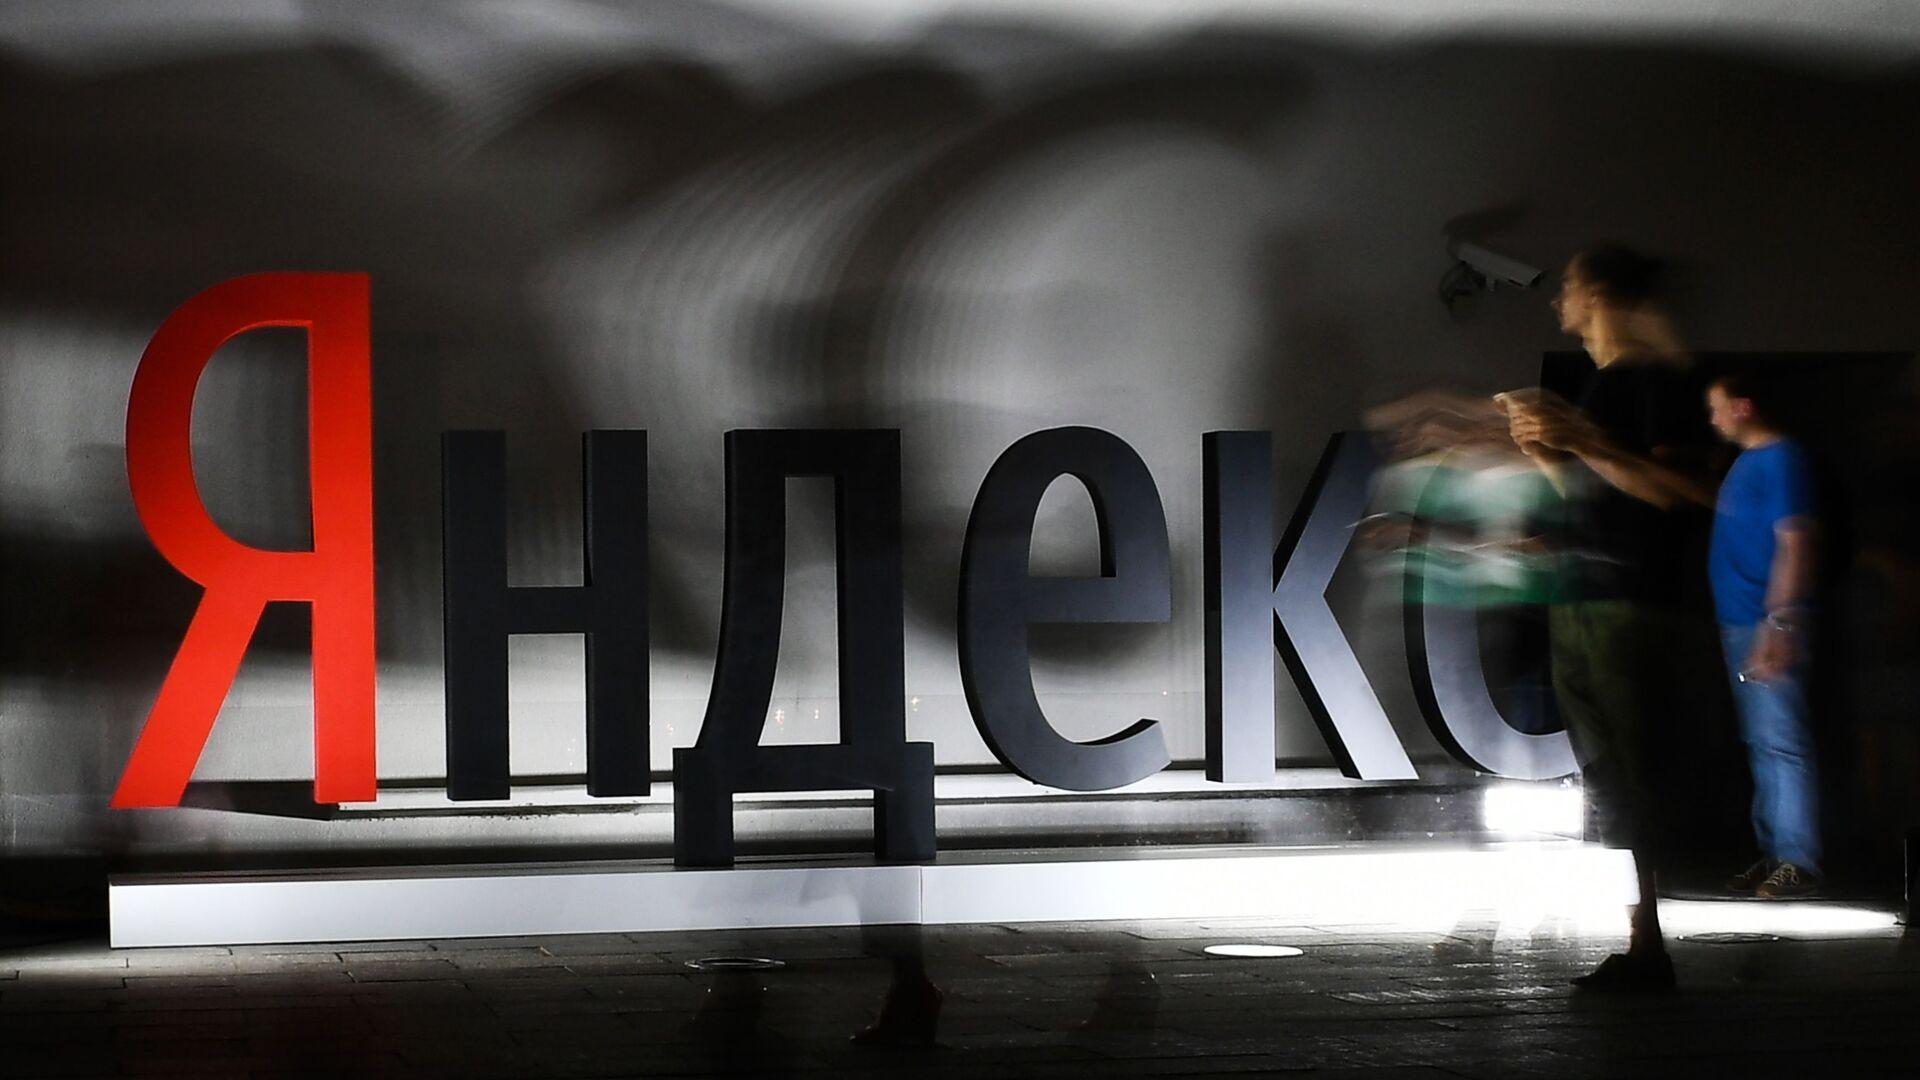 Логотип компании Яндекс - РИА Новости, 1920, 23.09.2020